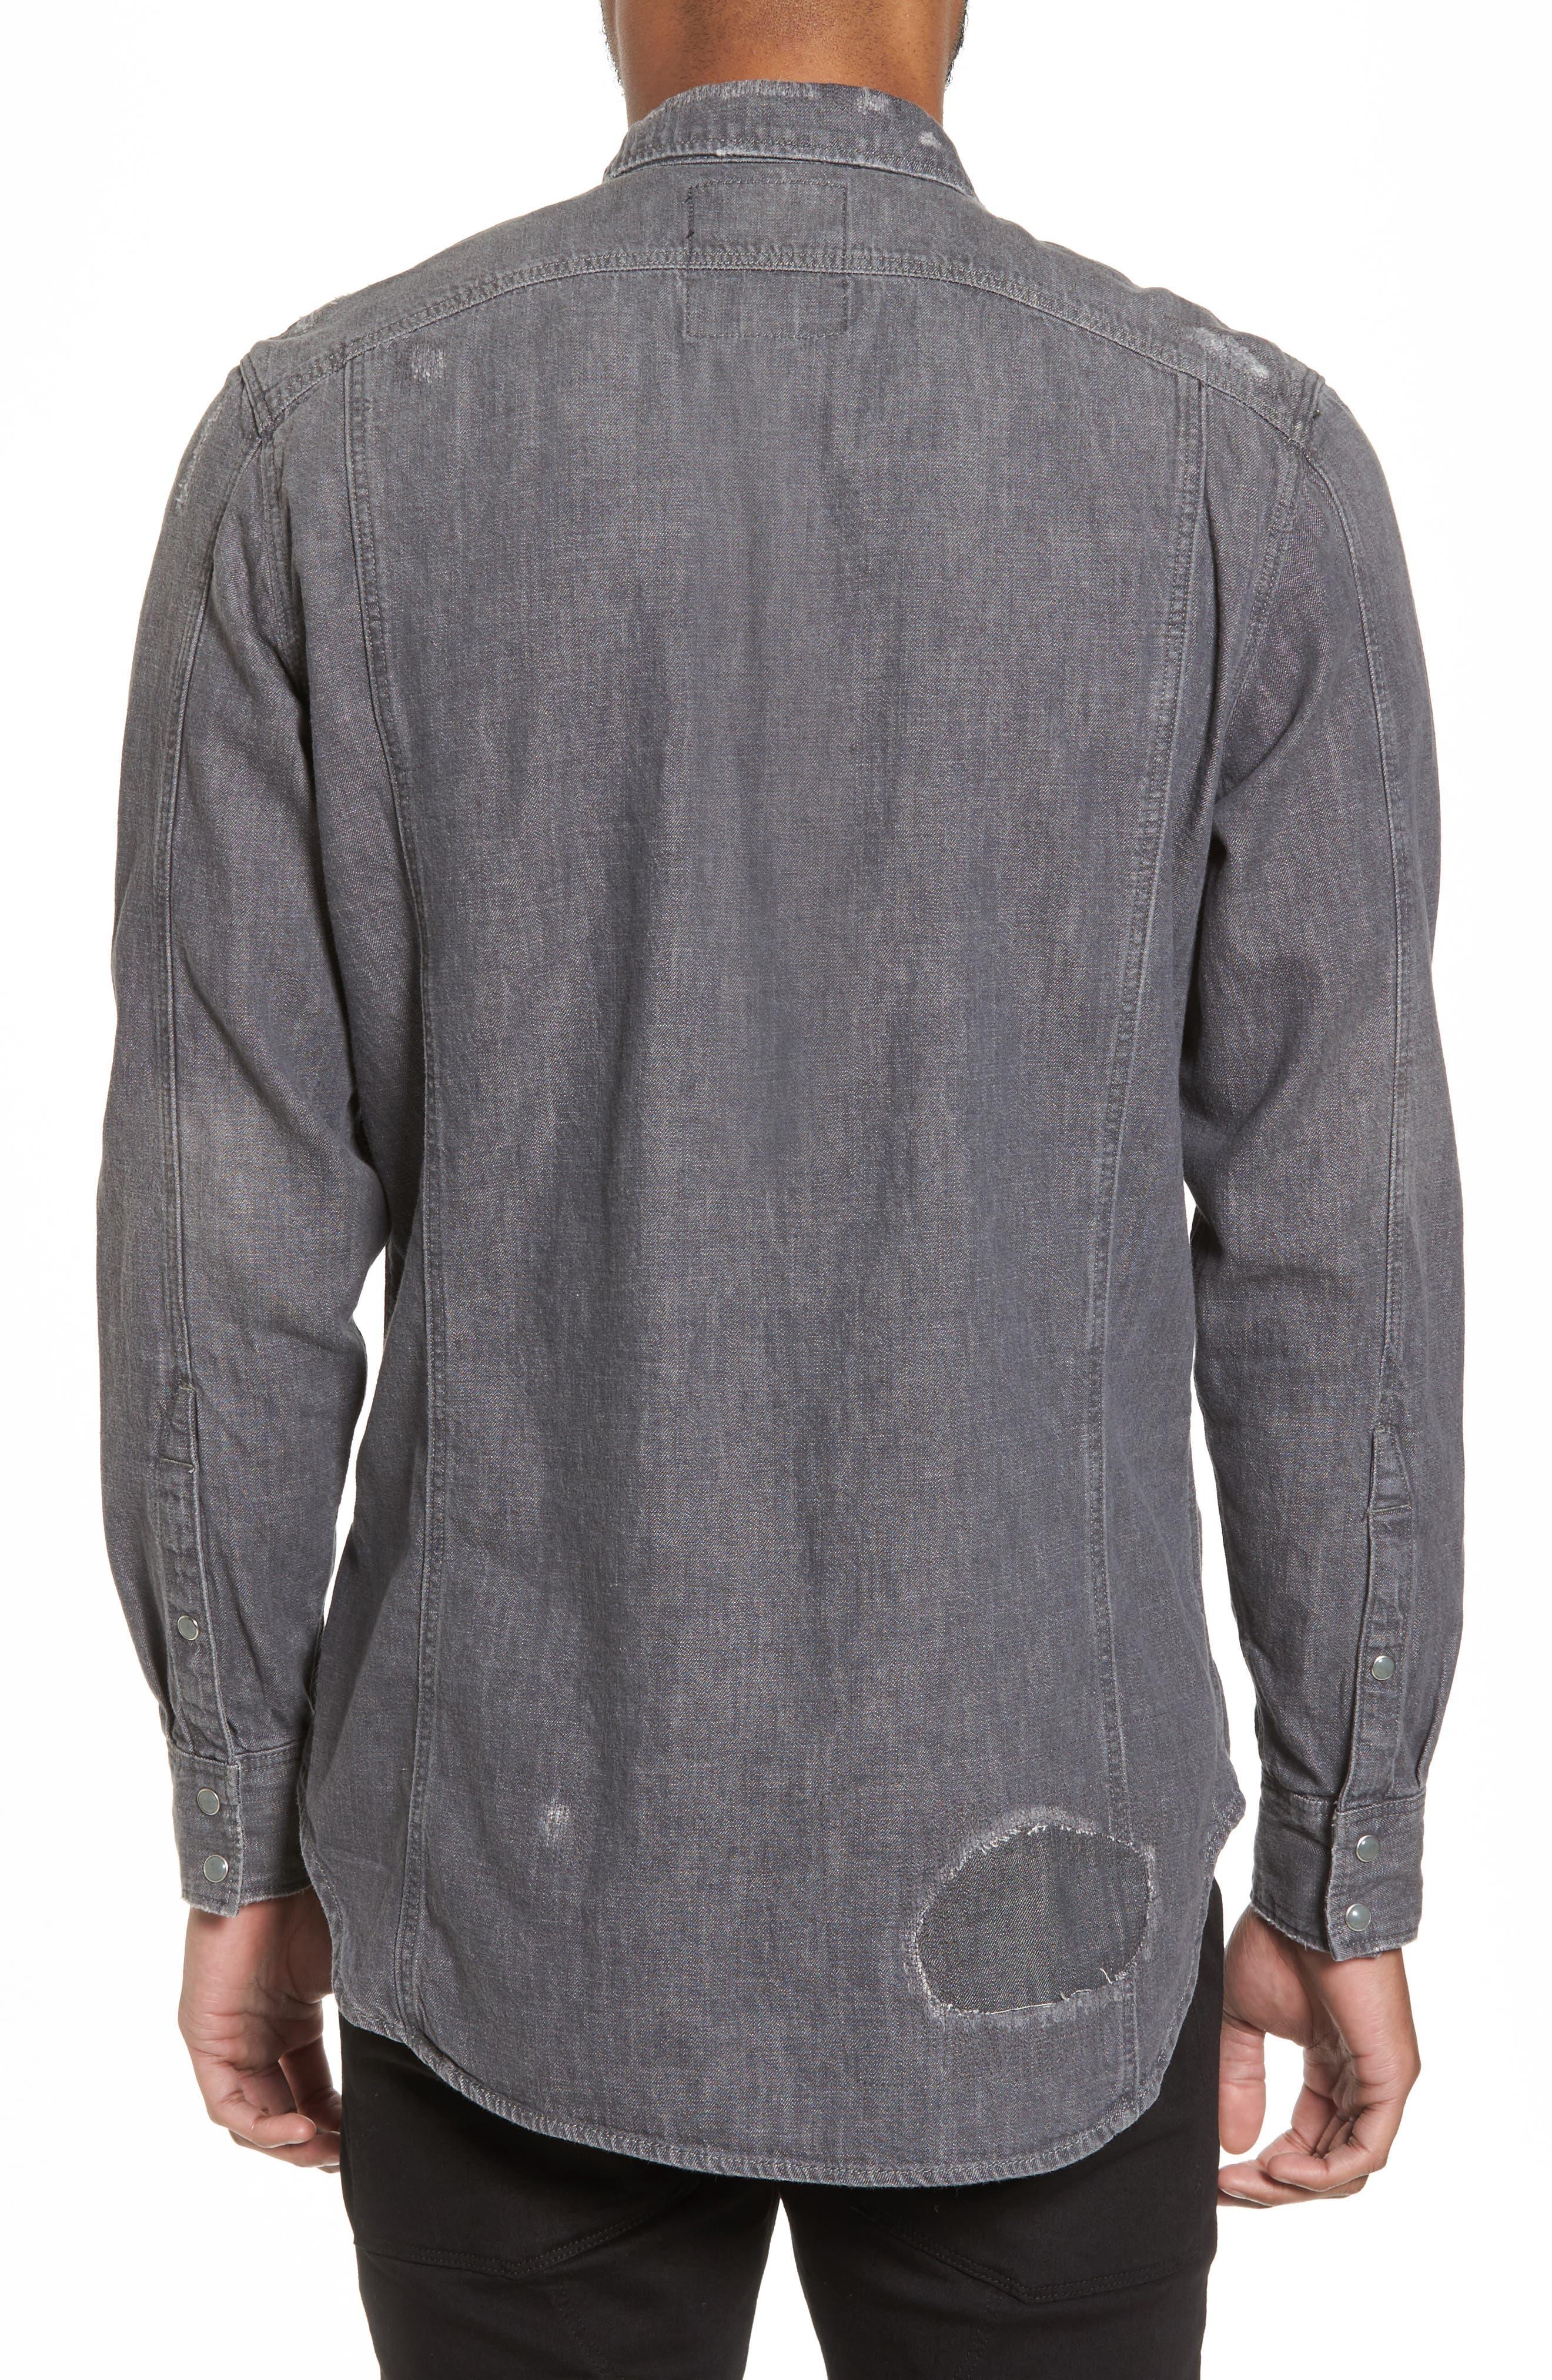 3301 Craser Denim Shirt,                             Alternate thumbnail 2, color,                             025